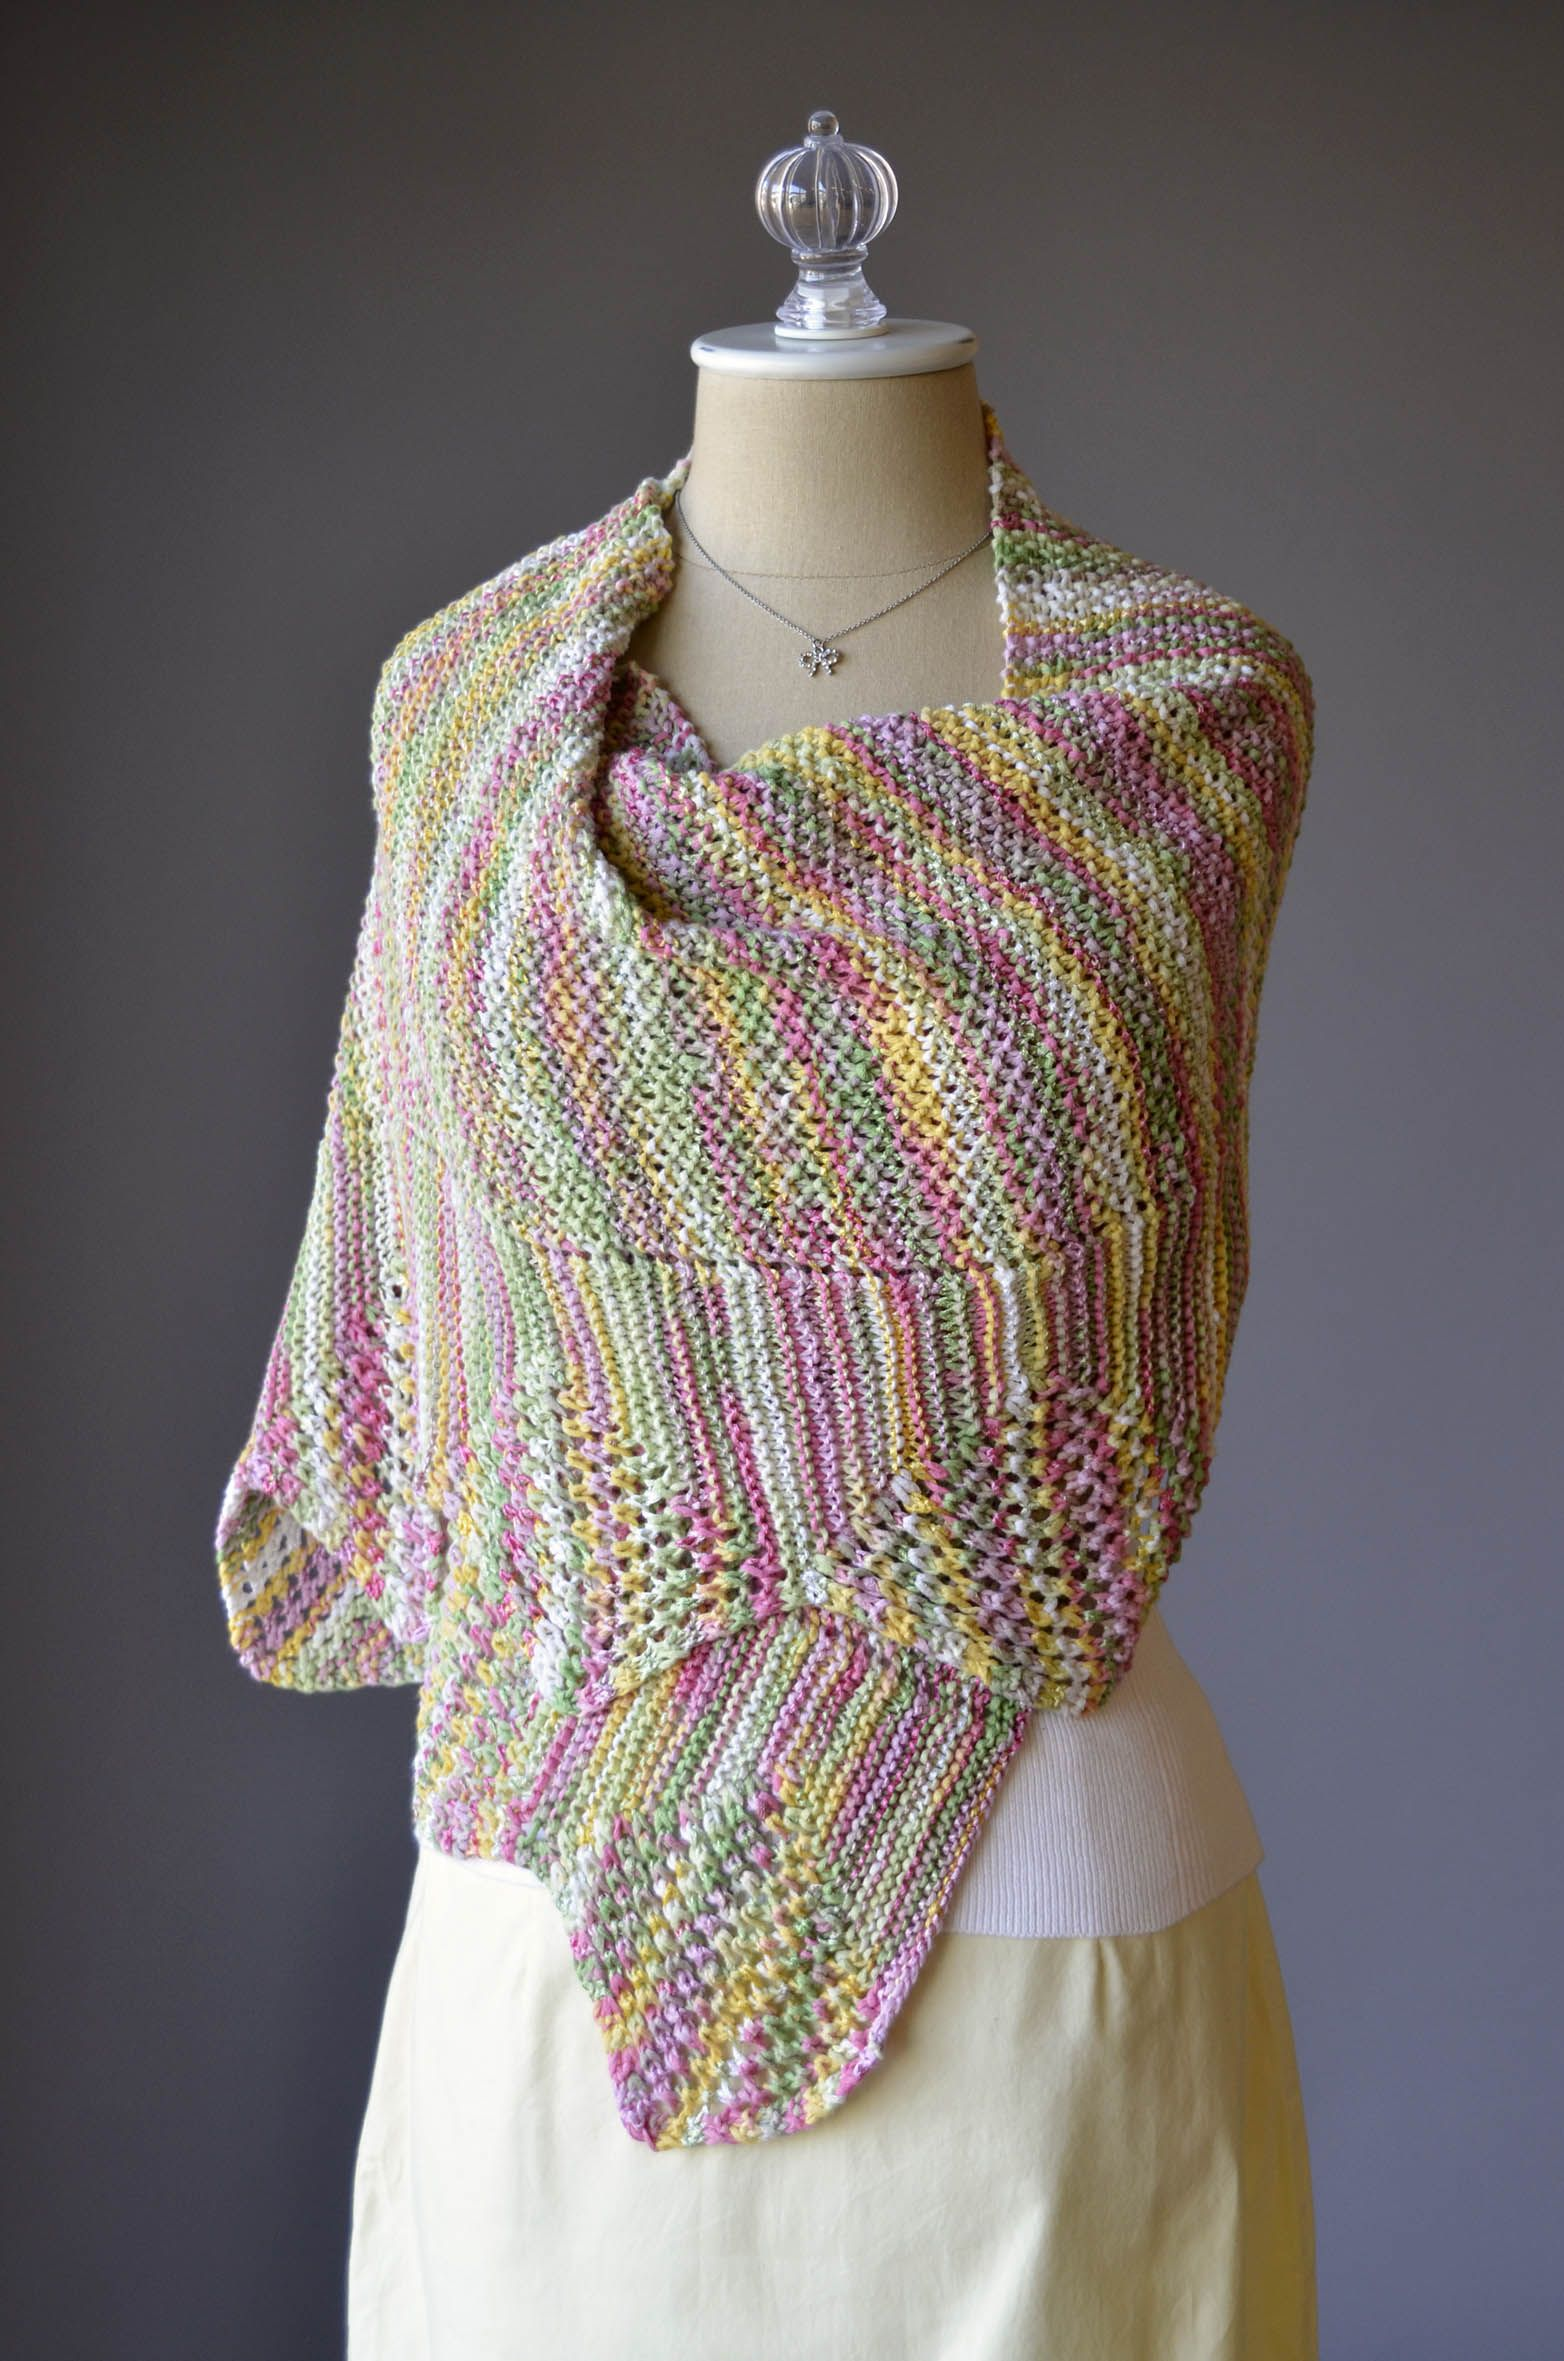 Free knitting pattern from universal yarn solitaire stole in free knitting pattern from universal yarn solitaire stole in rozetti yarns lumen multi bankloansurffo Choice Image